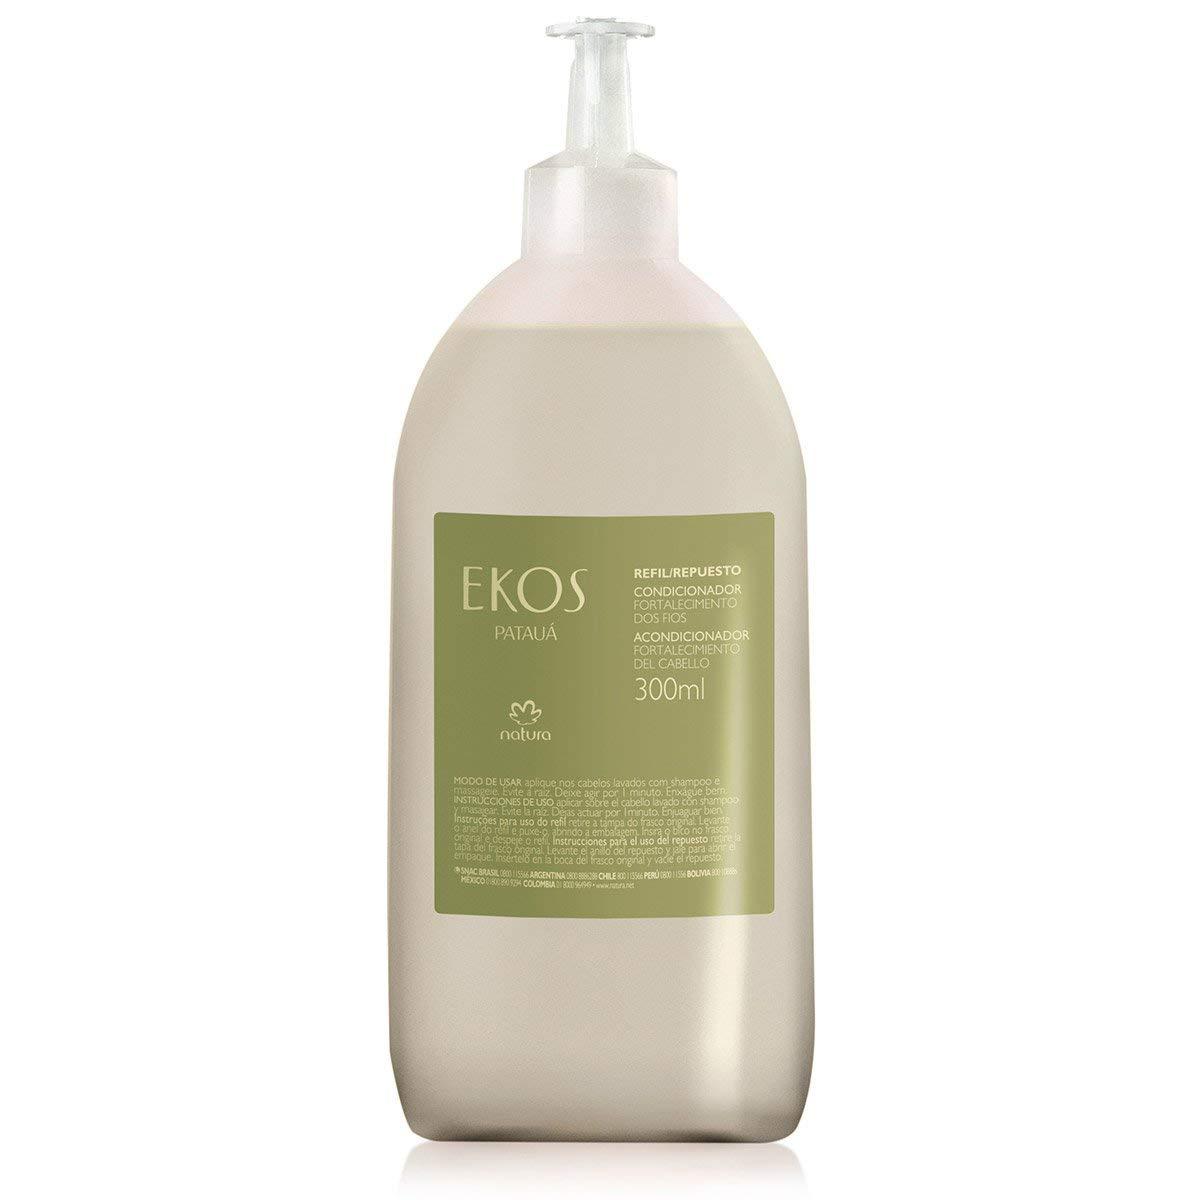 Linha Ekos (Pataua) Natura - Condicionador Fortalecimento dos Fios (Refil) 300 Ml - (Natura Ekos (Pataua) Collection - Hair Strengthening Conditioner (Refill) 10.14 Fl Oz)